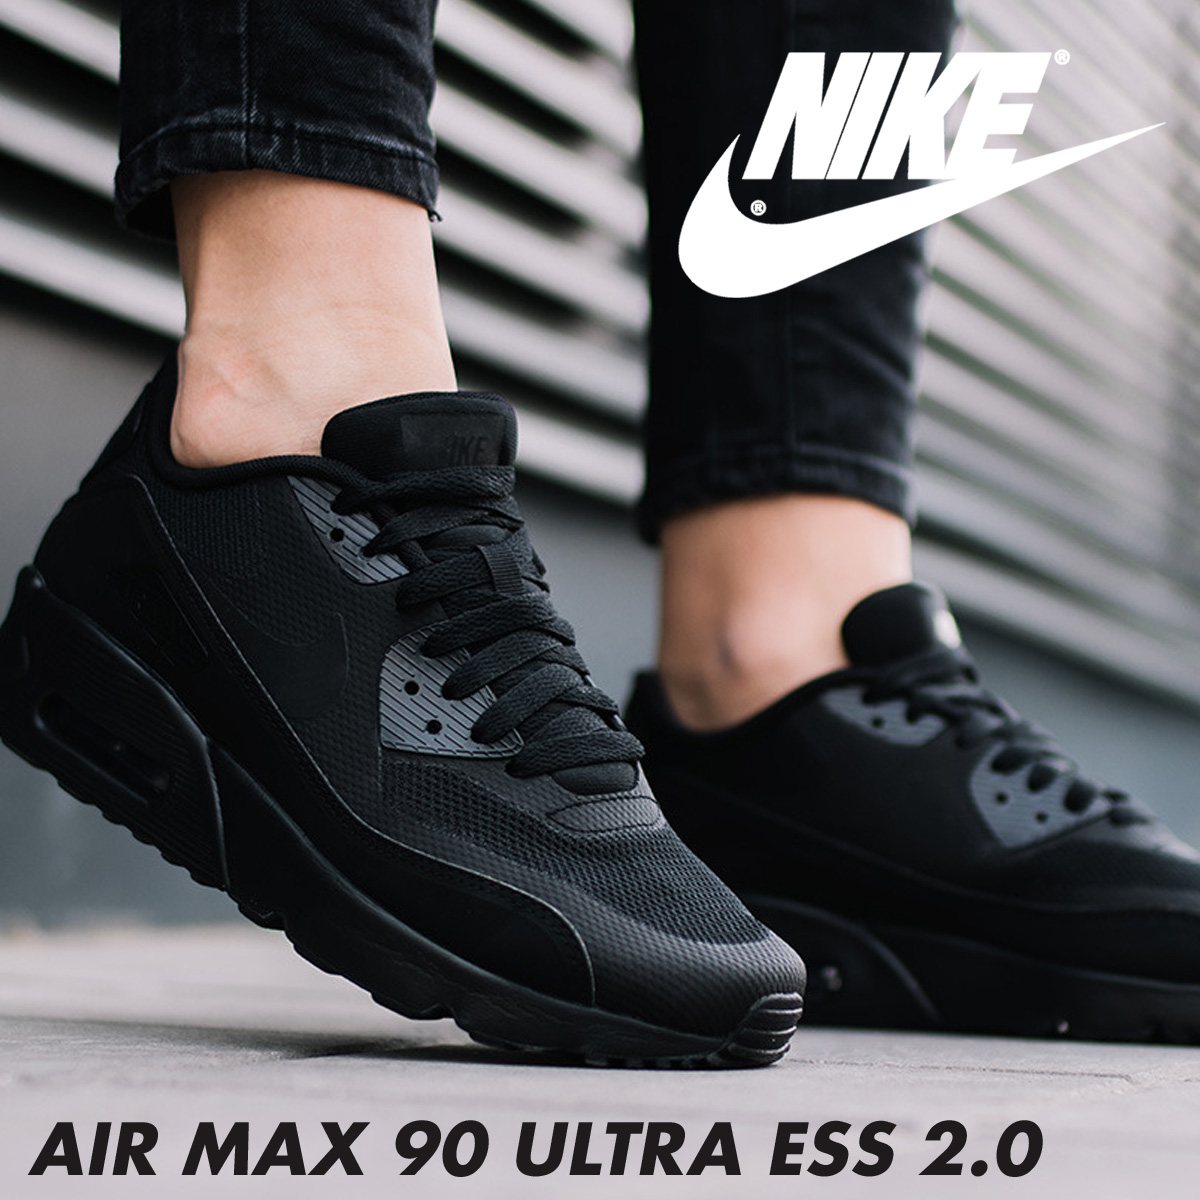 Sugar Online Shop: NIKE Kie Ney AMAX 90 Lady's sneakers WMNS